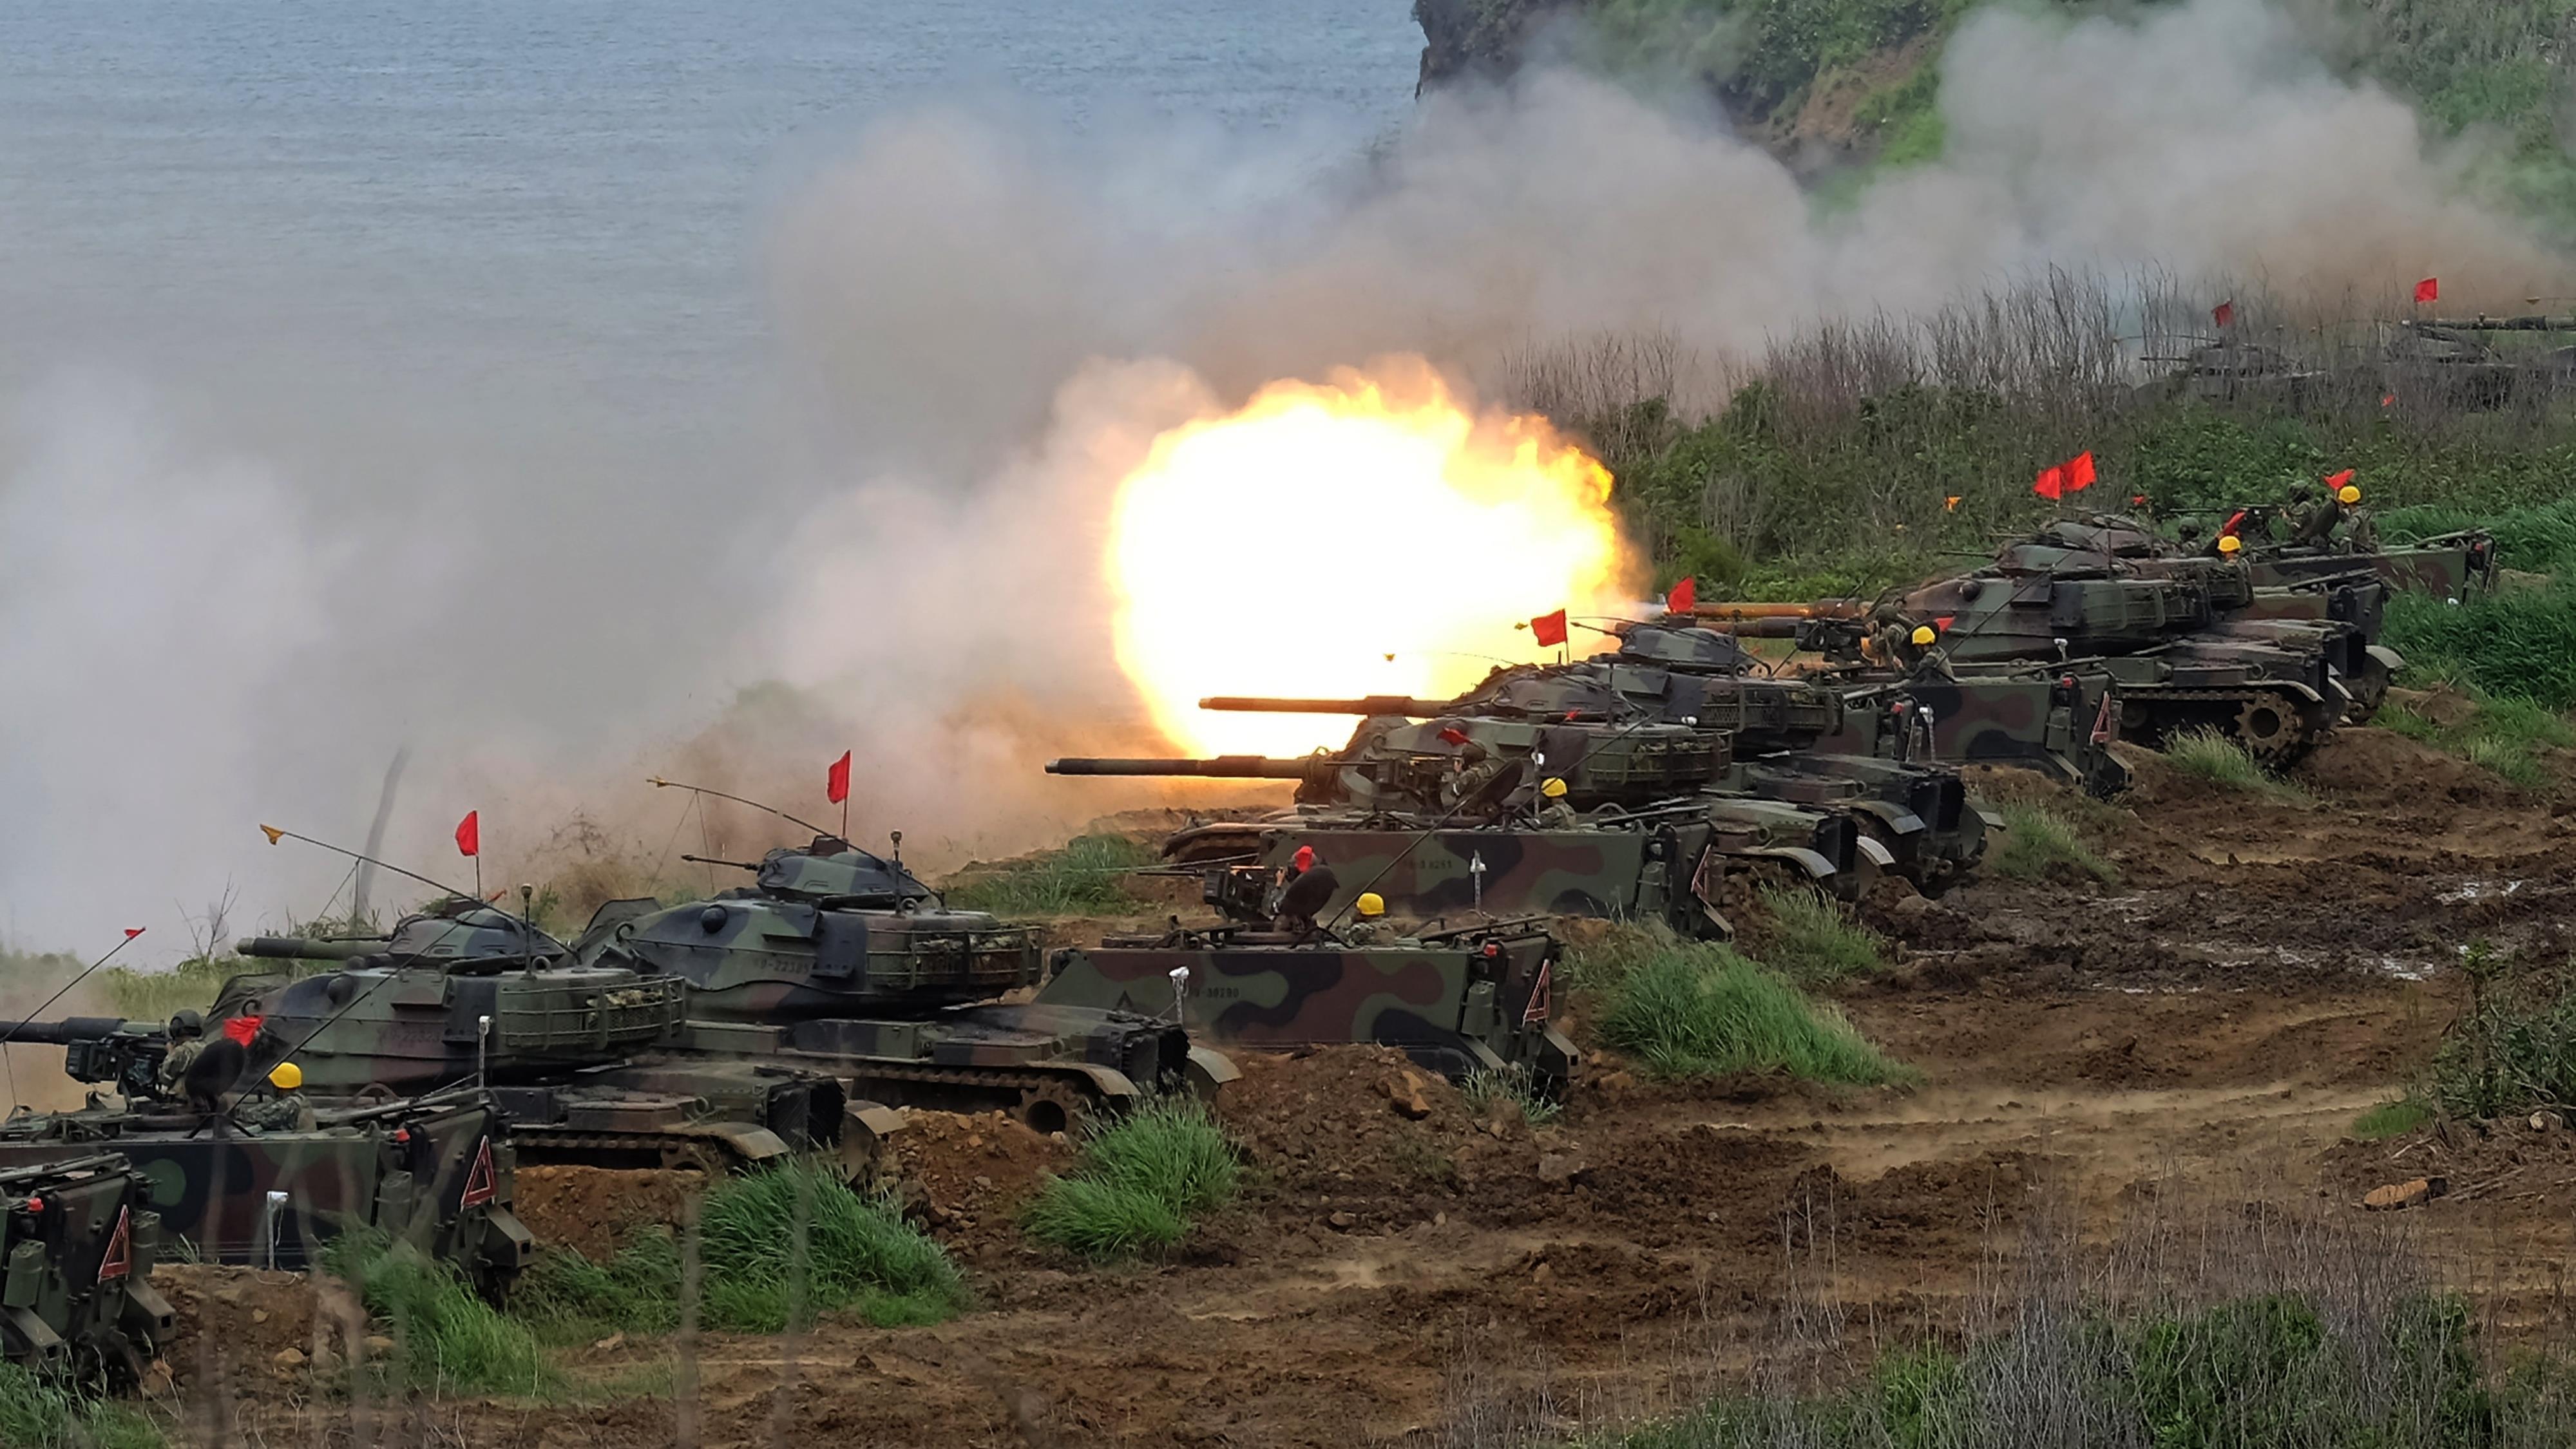 Des chars d'assaut américains lors d'un exercice de tir